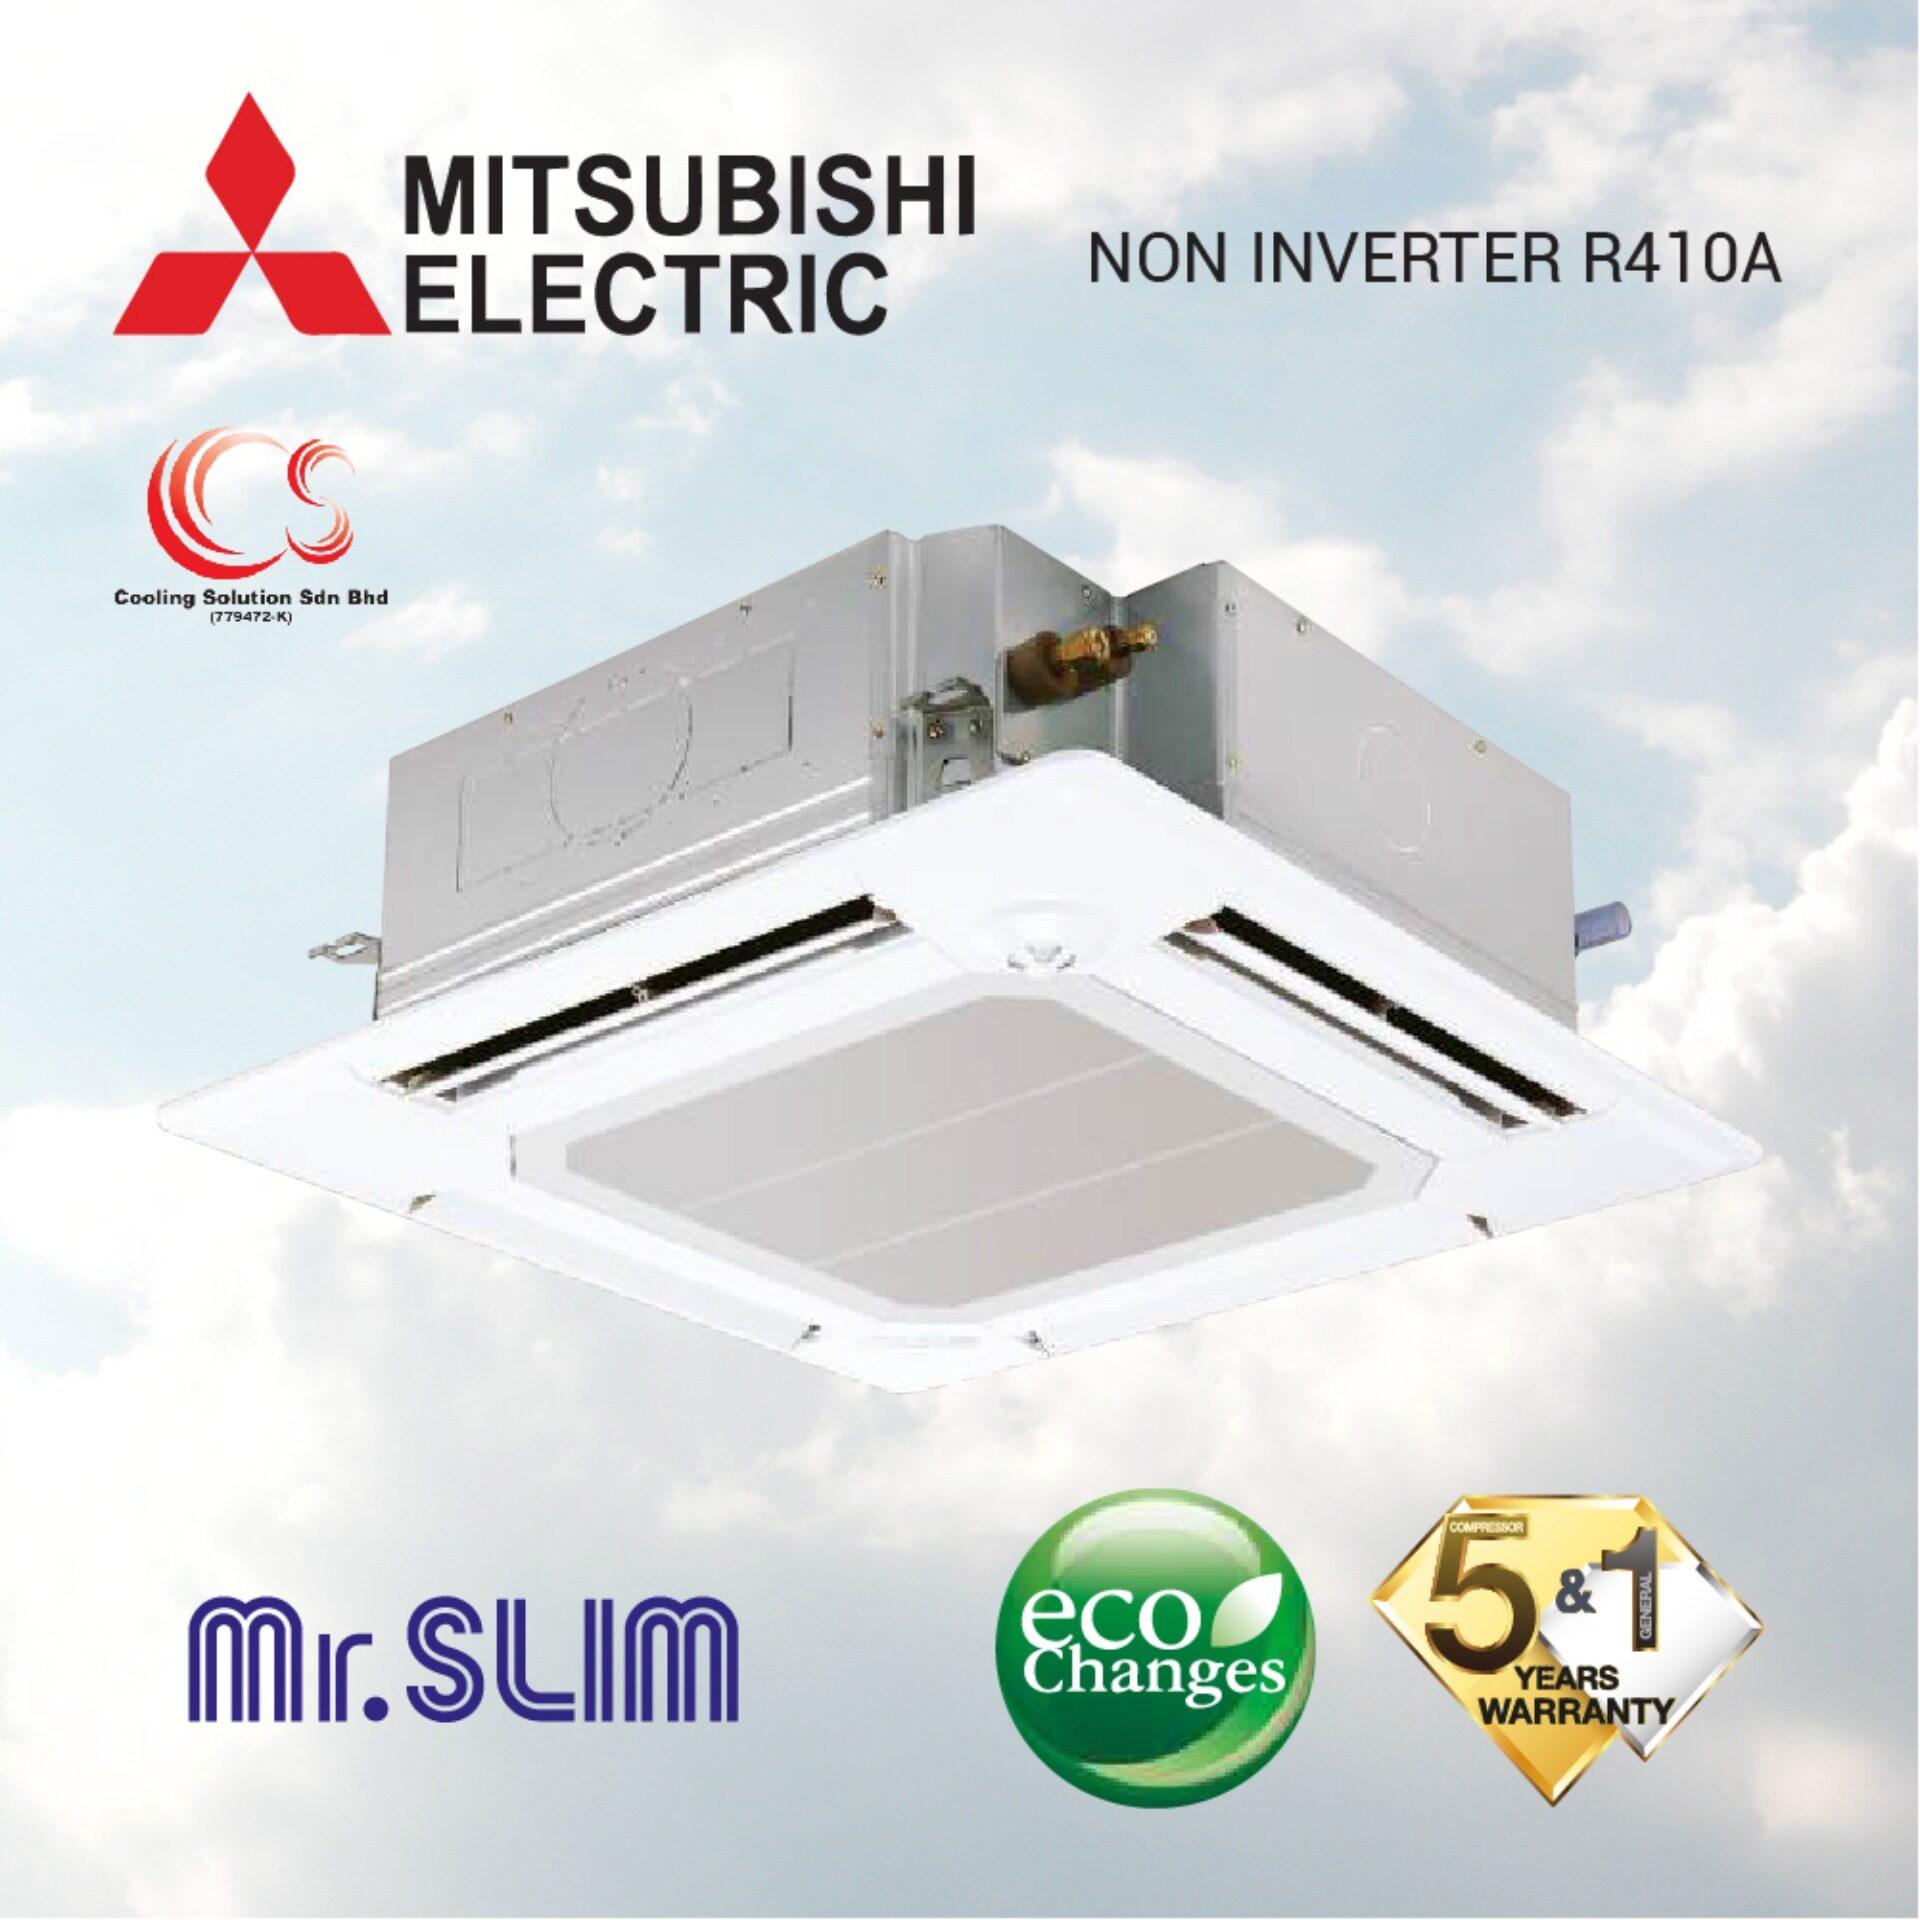 MITSUBISHI CASSETTE NON INVERTER R410 2.5HP PL-P24BALCM